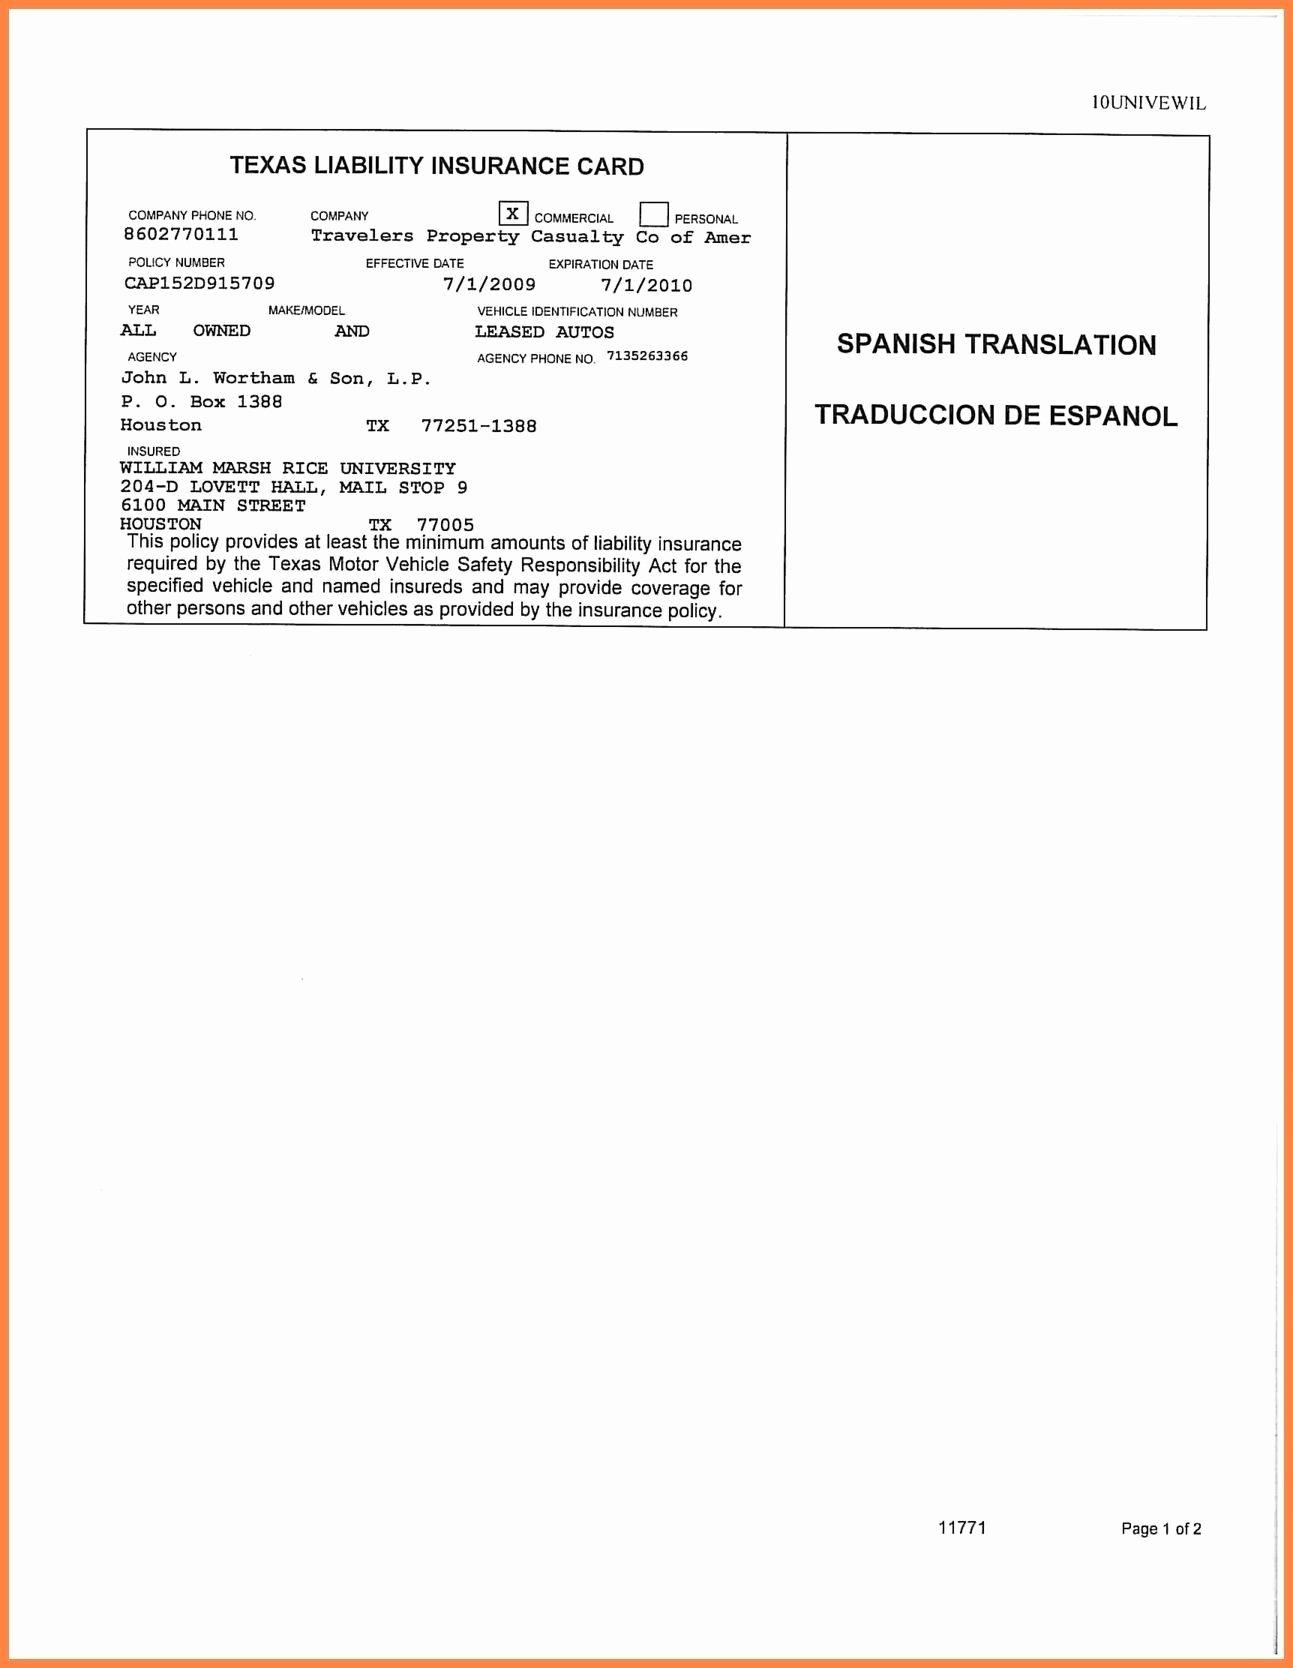 Auto Insurance Templates Lovely Car Insurance Card Template Free Auto Insurance Card